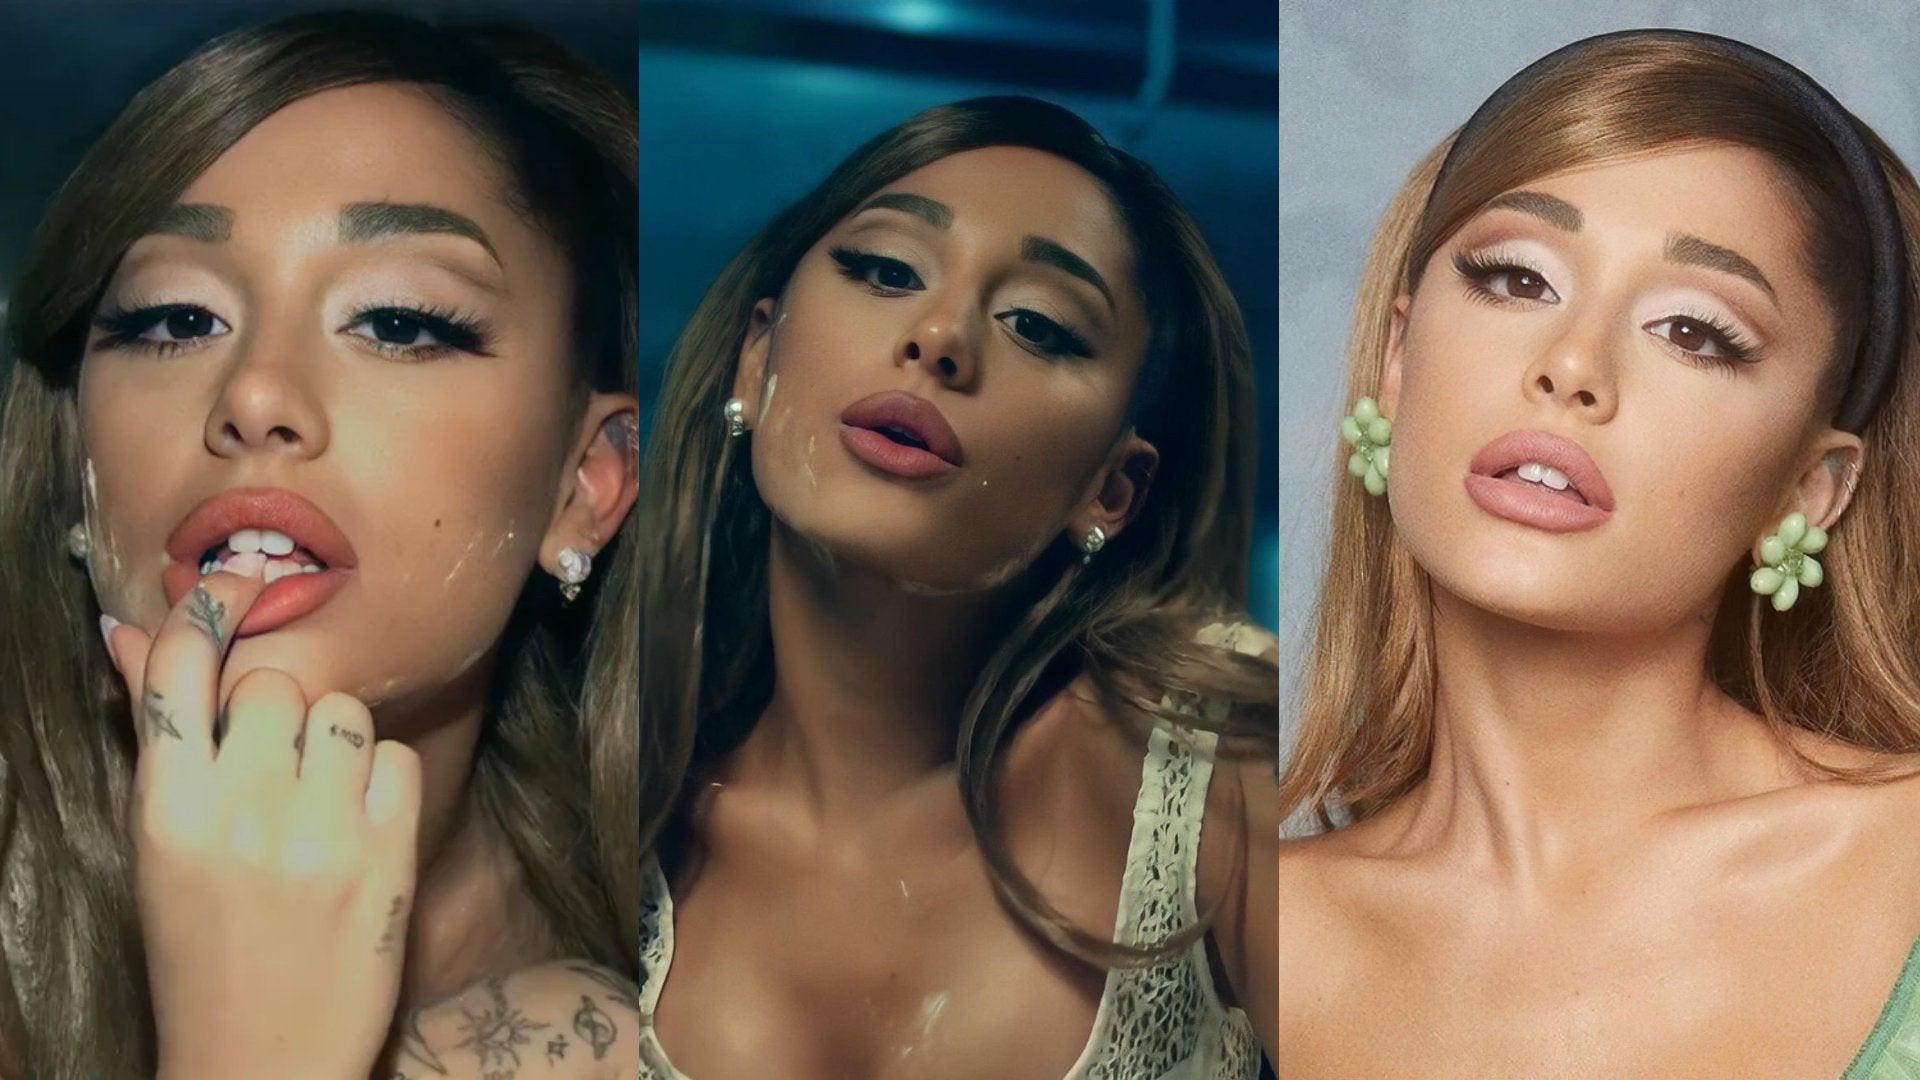 Ariana Grande's Lips